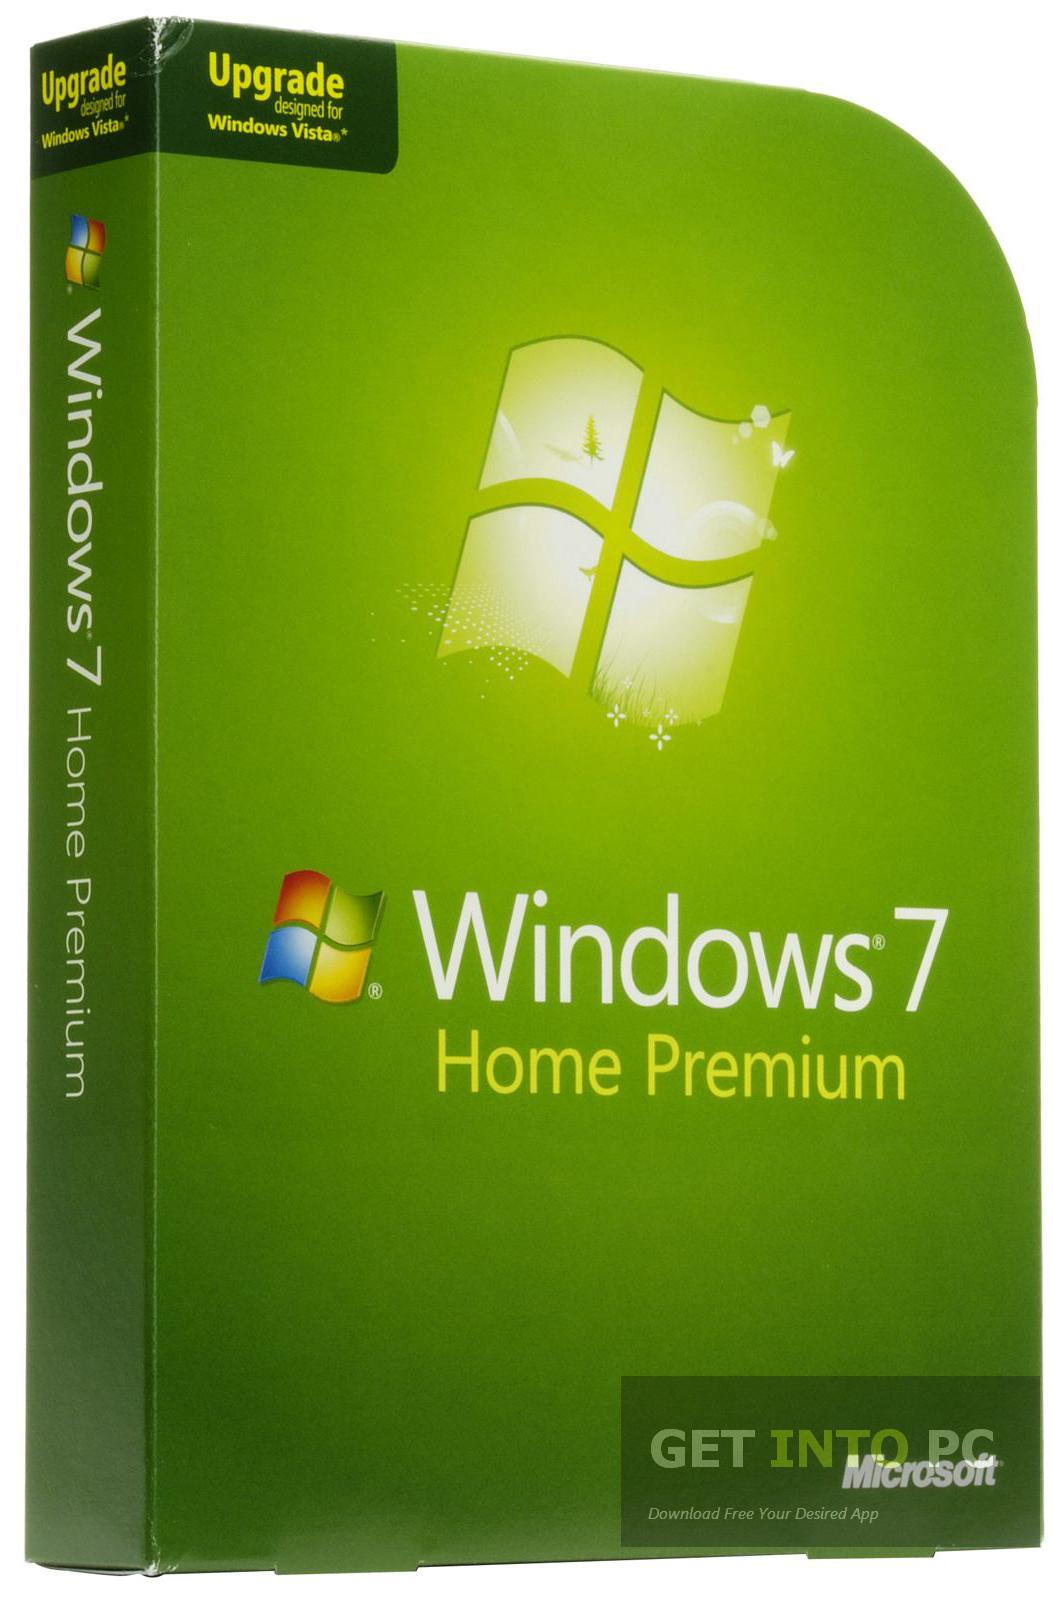 Windows 7 Home Premium Free Download